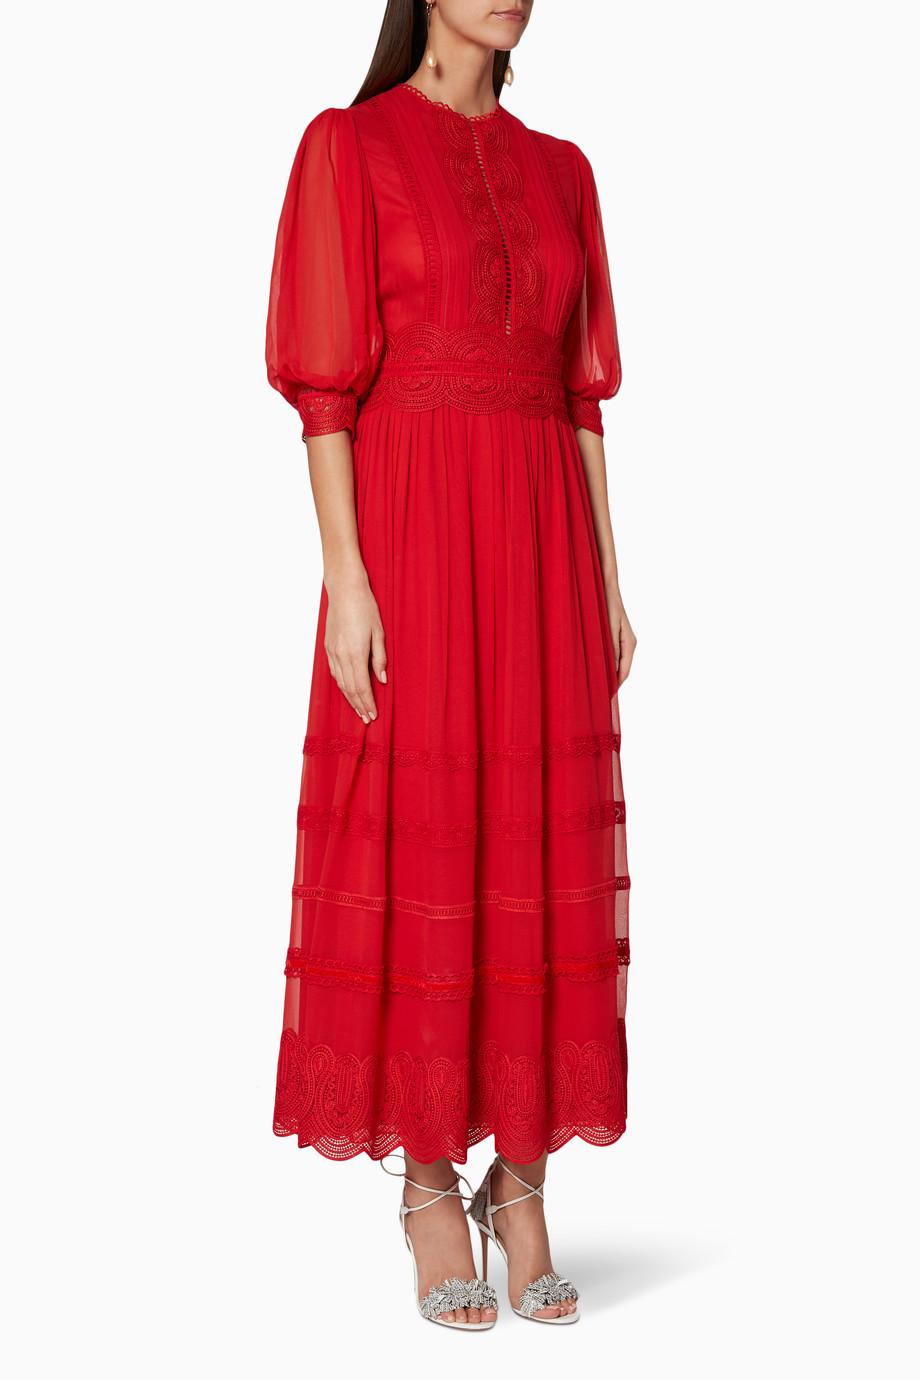 5367e7728 تسوق فستان طويل بأشرطة دانتيل بحواف صدفية أحمر Costarellos أحمر ...